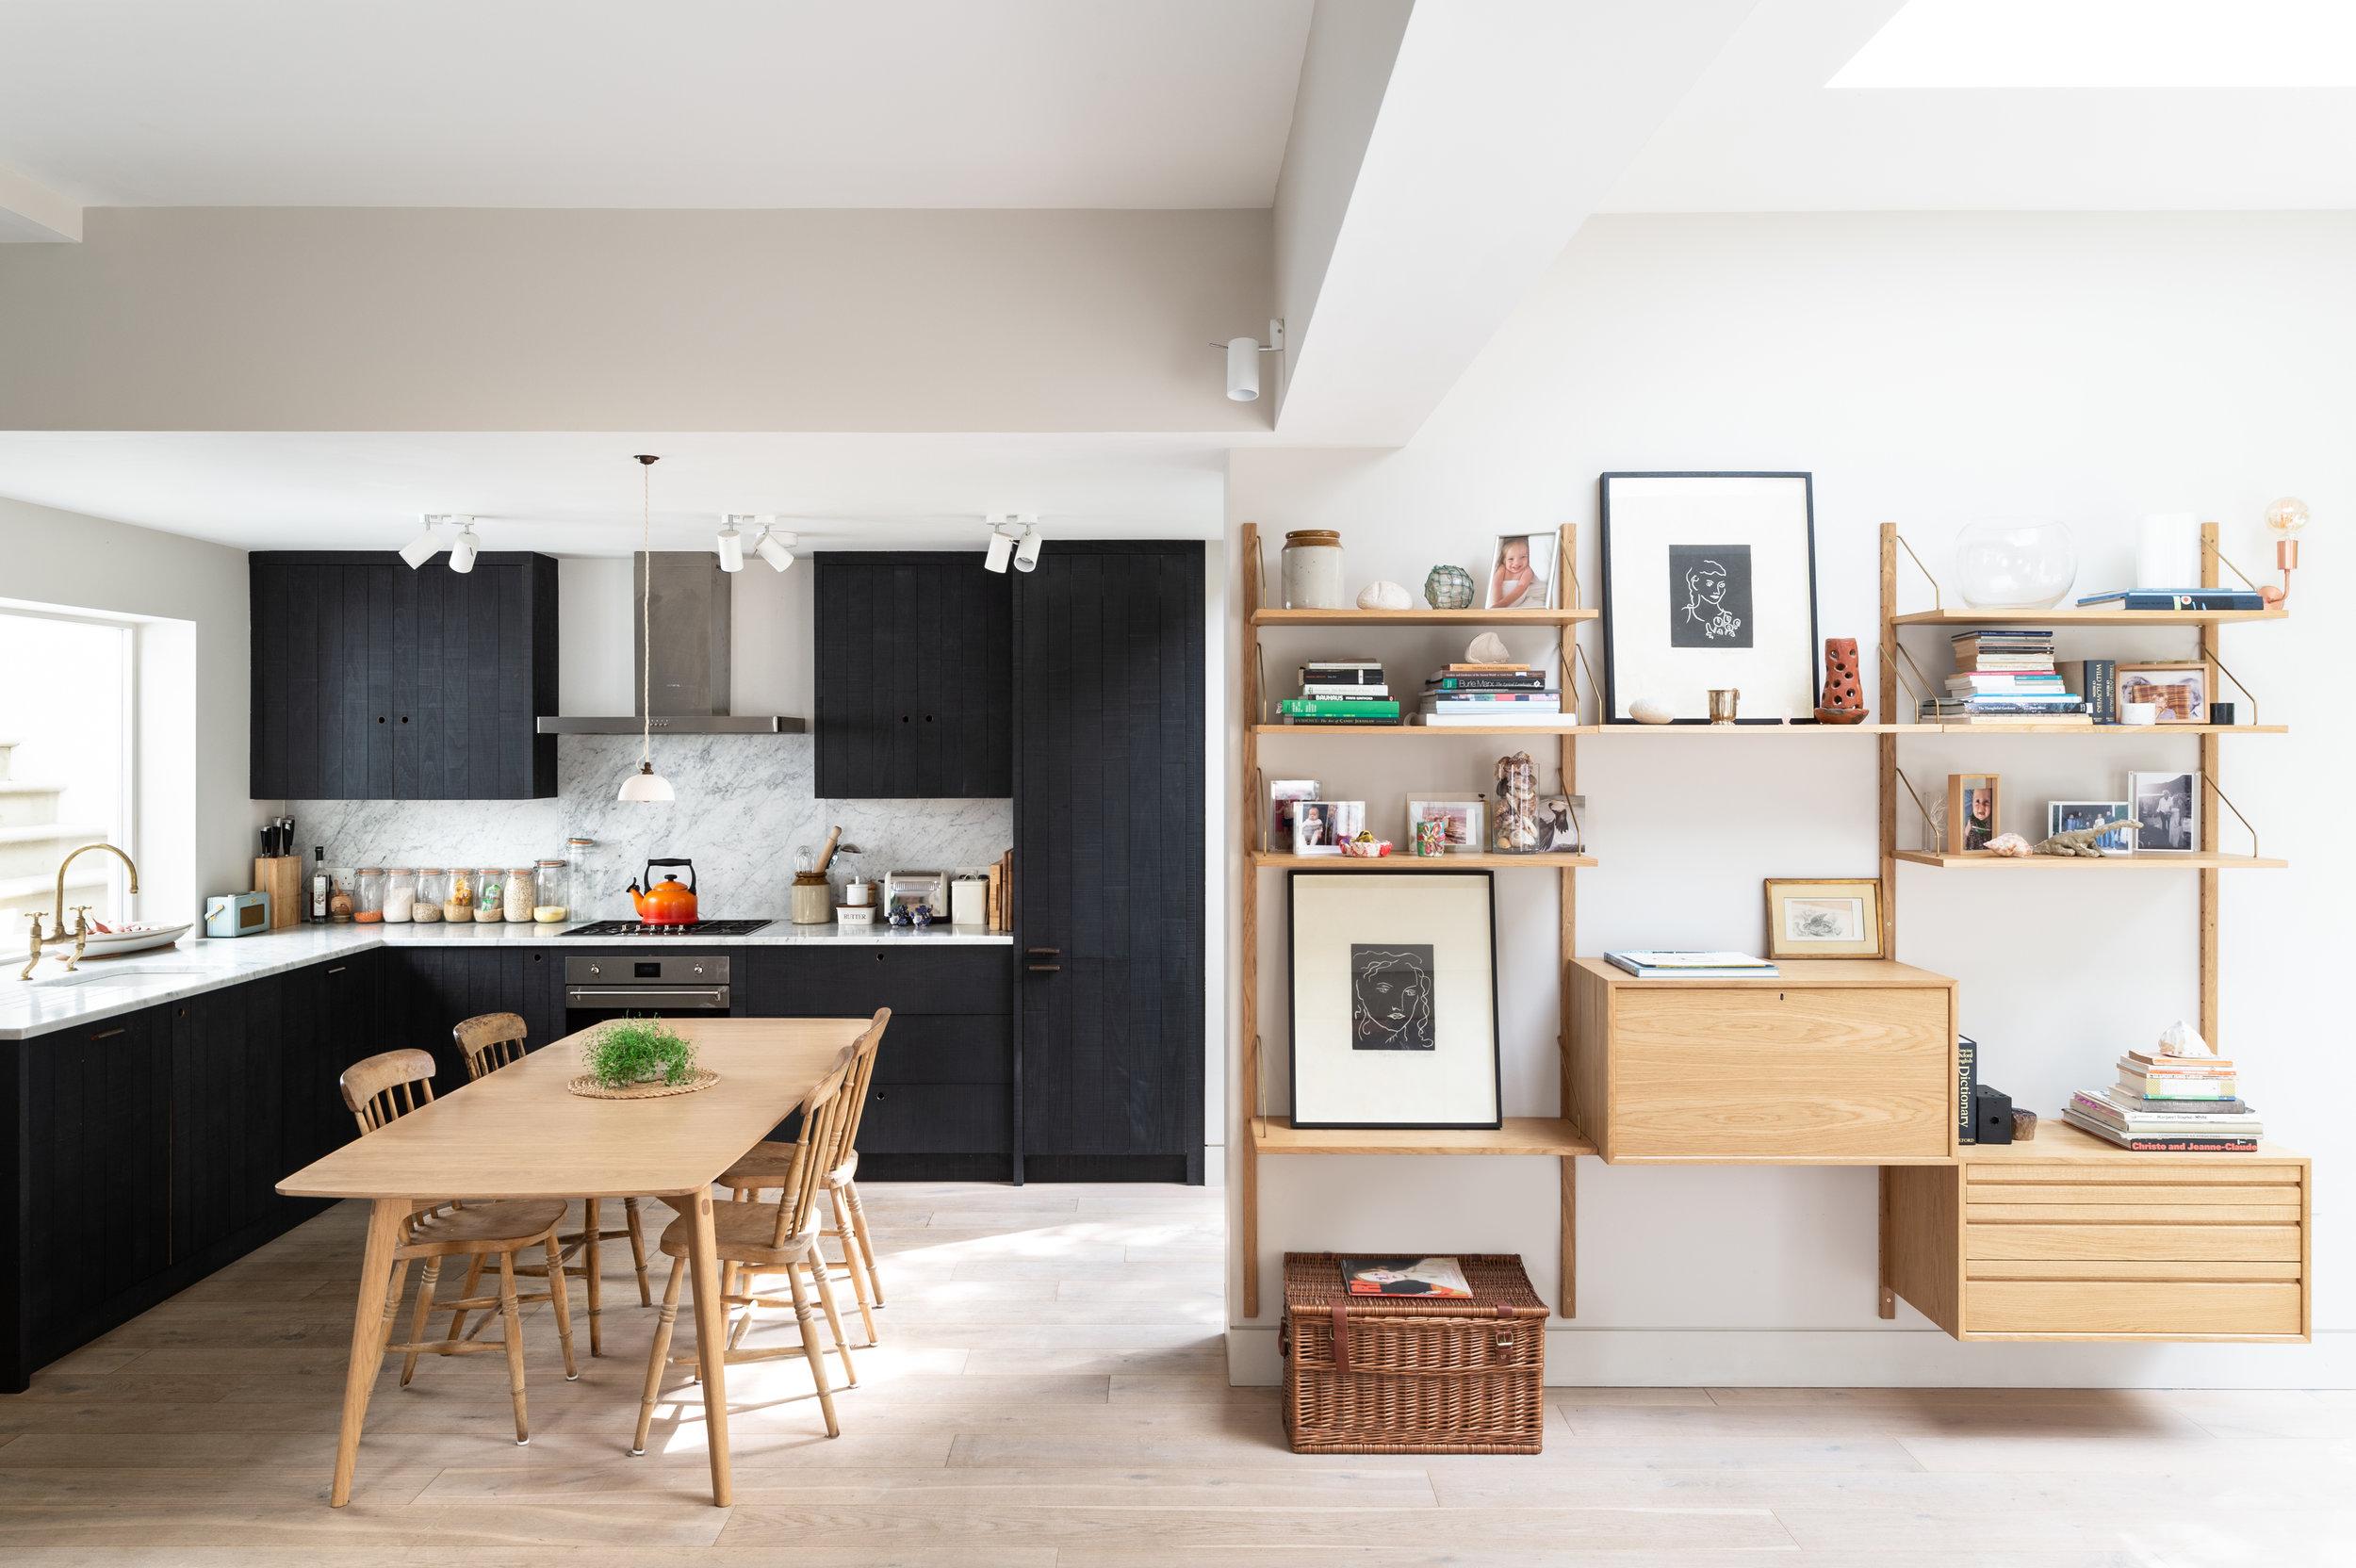 Elgin Avenue Kitchen/Dining - MW Architects